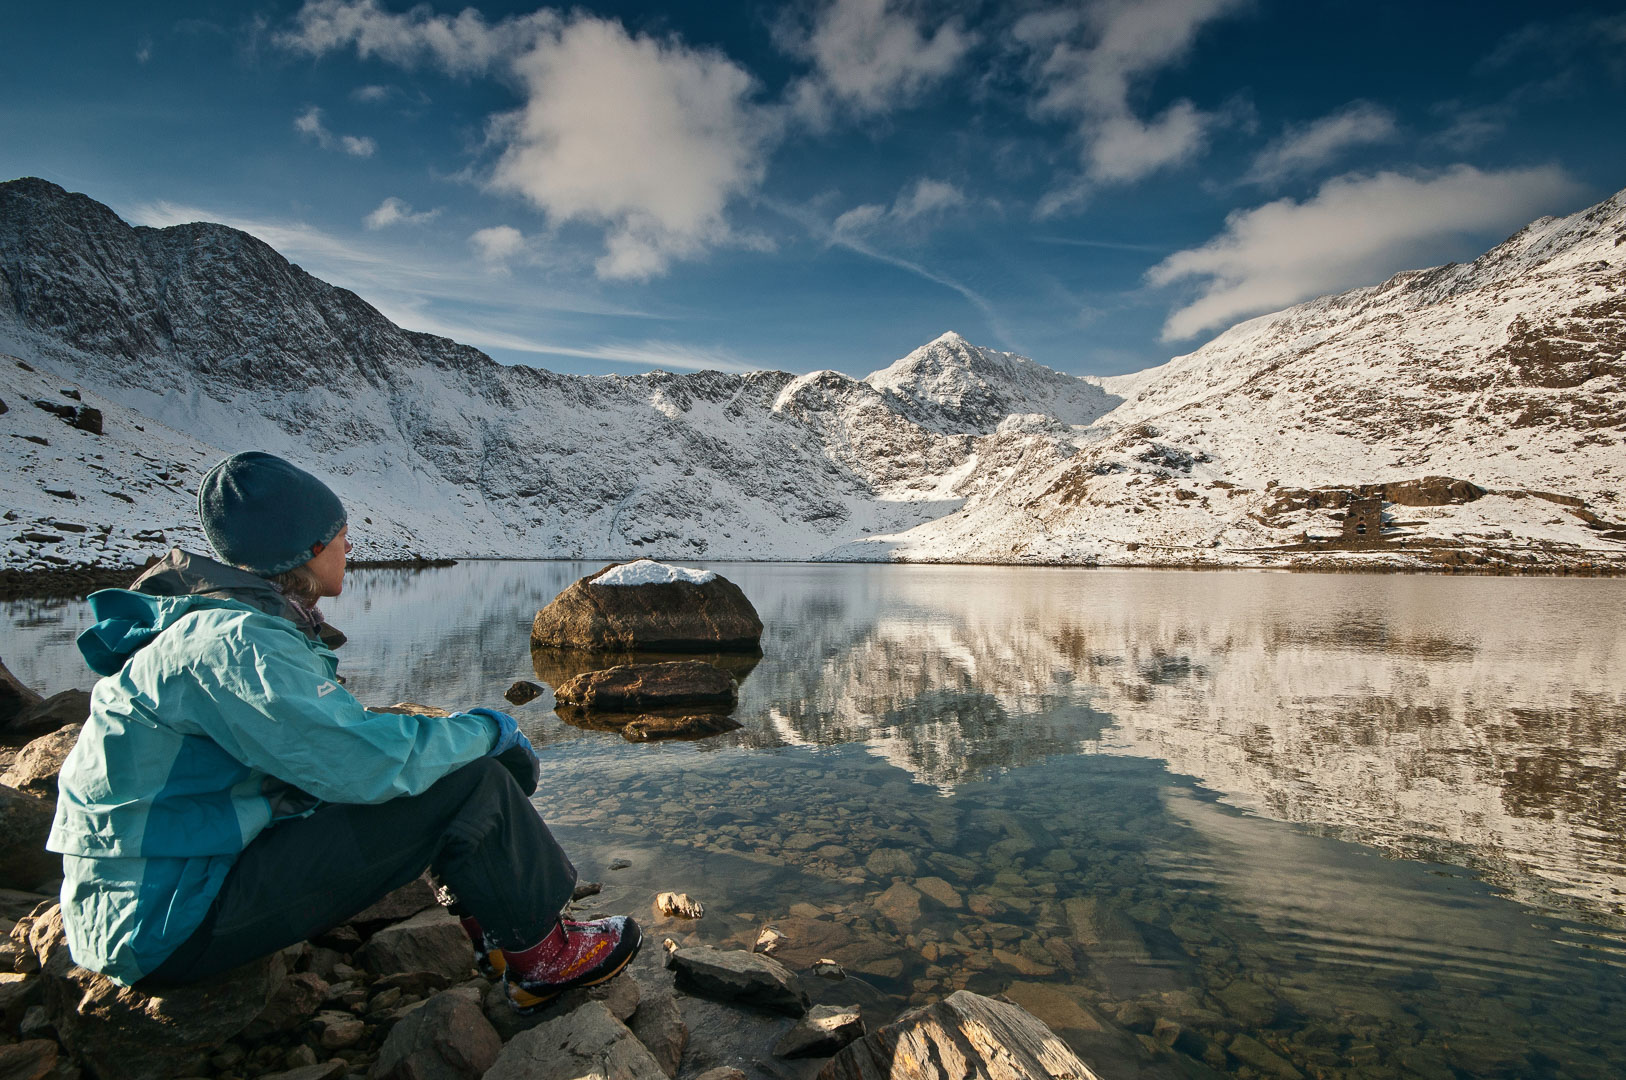 Snowdonia Experiences To Make you Happy This Christmas